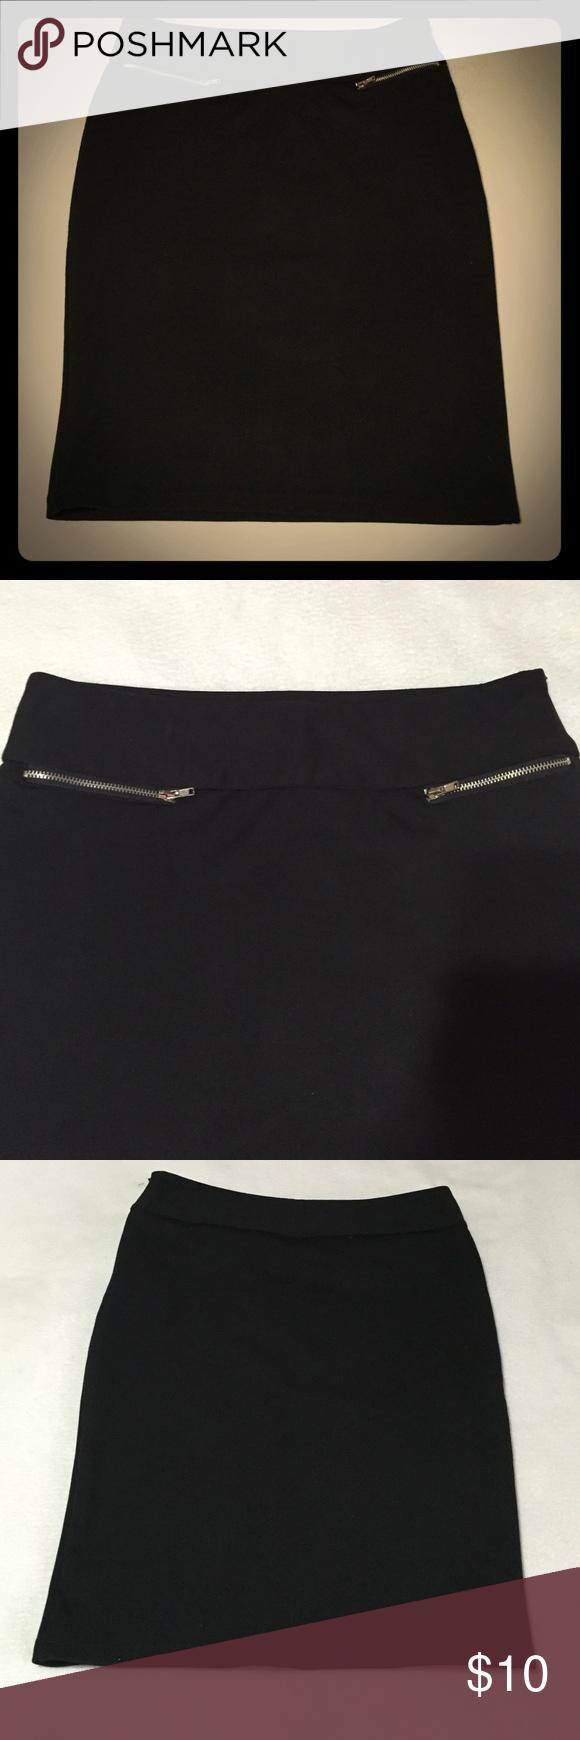 Pencil skirt w/zipper detail size 3 Like new. Heart Crush Skirts Pencil